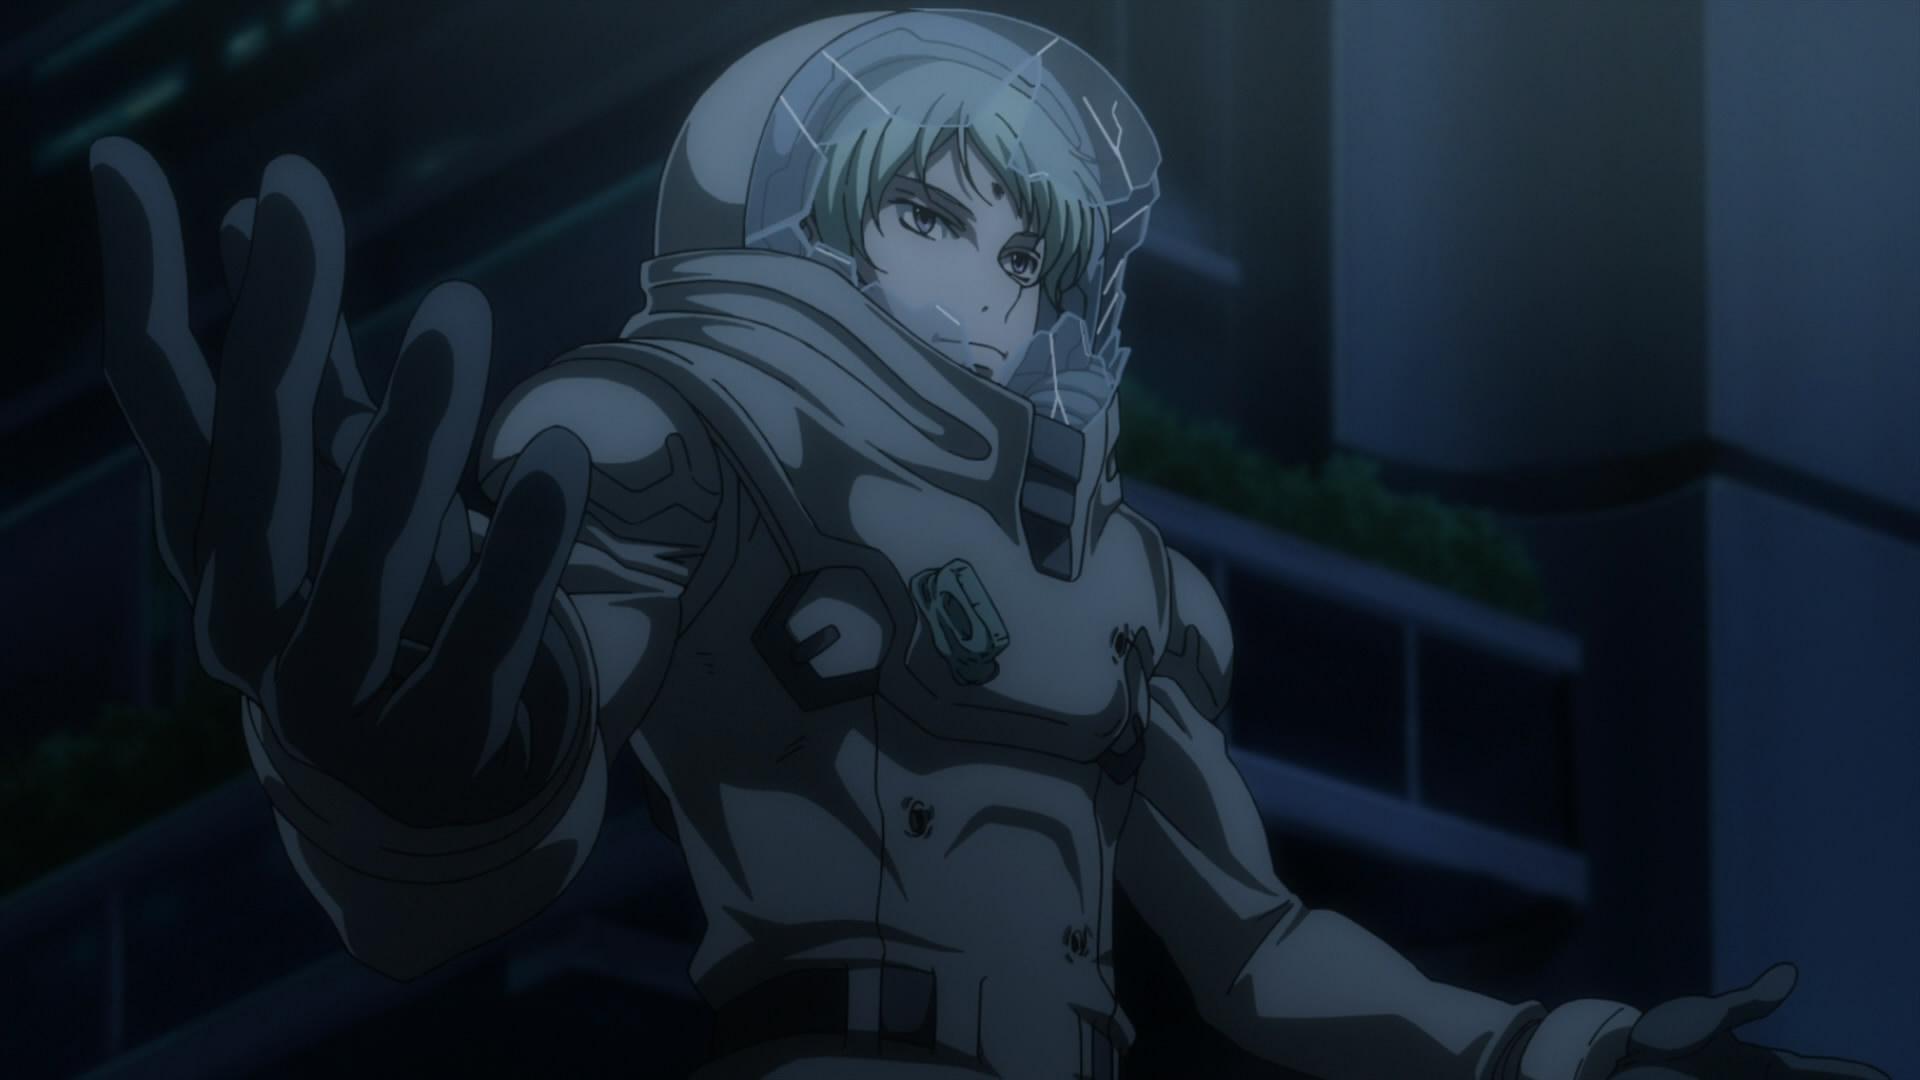 [gSS]_Mobile_Suit_Gundam_00_-_A_wakening_of_the_Trailblazer_(1080p)_[2B252856].mkv_snapshot_00.38.34_[2011.01.07_04.24.24]